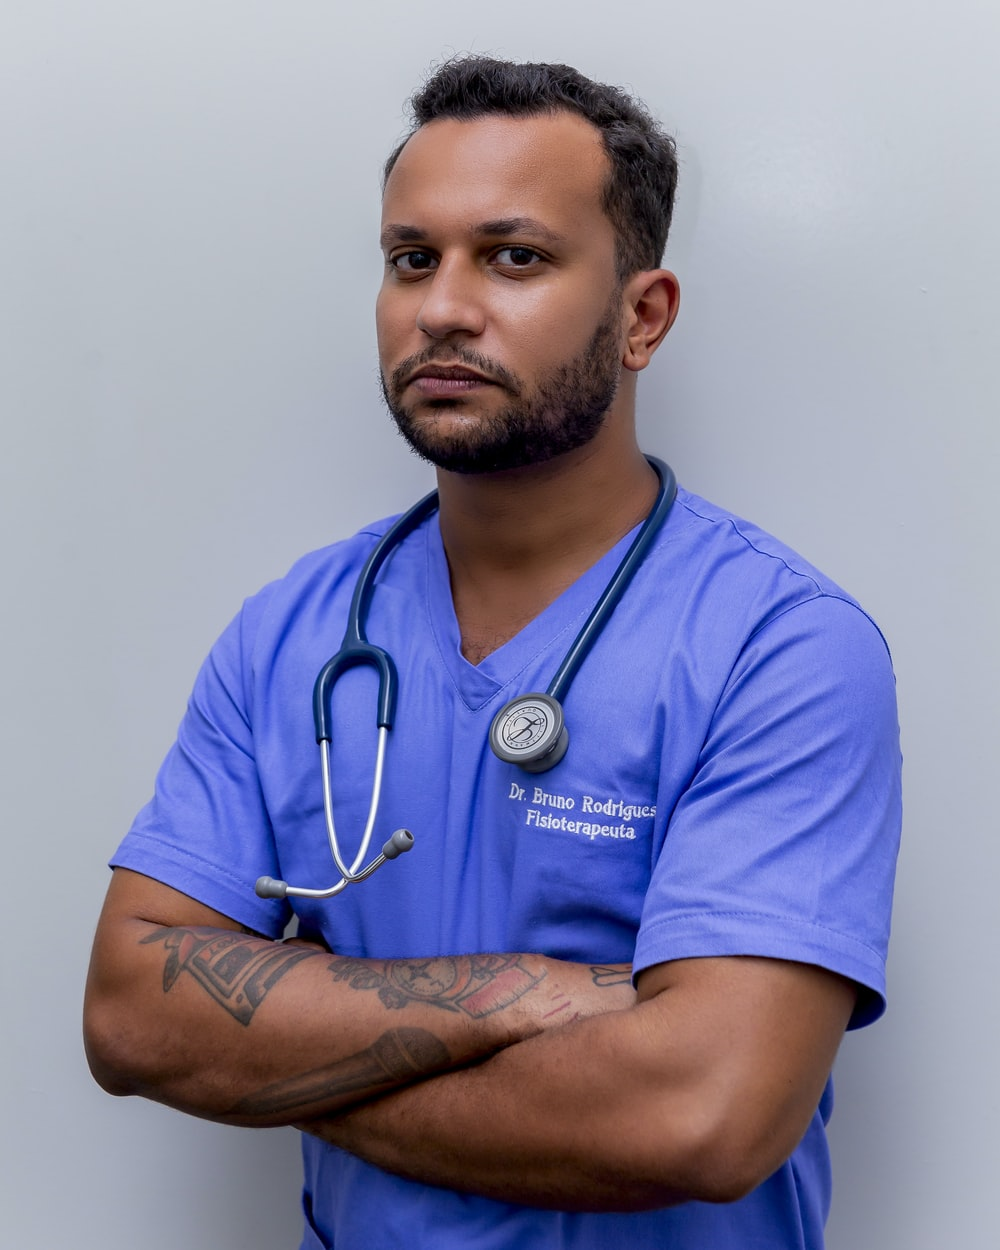 man in blue crew neck t-shirt wearing blue stethoscope